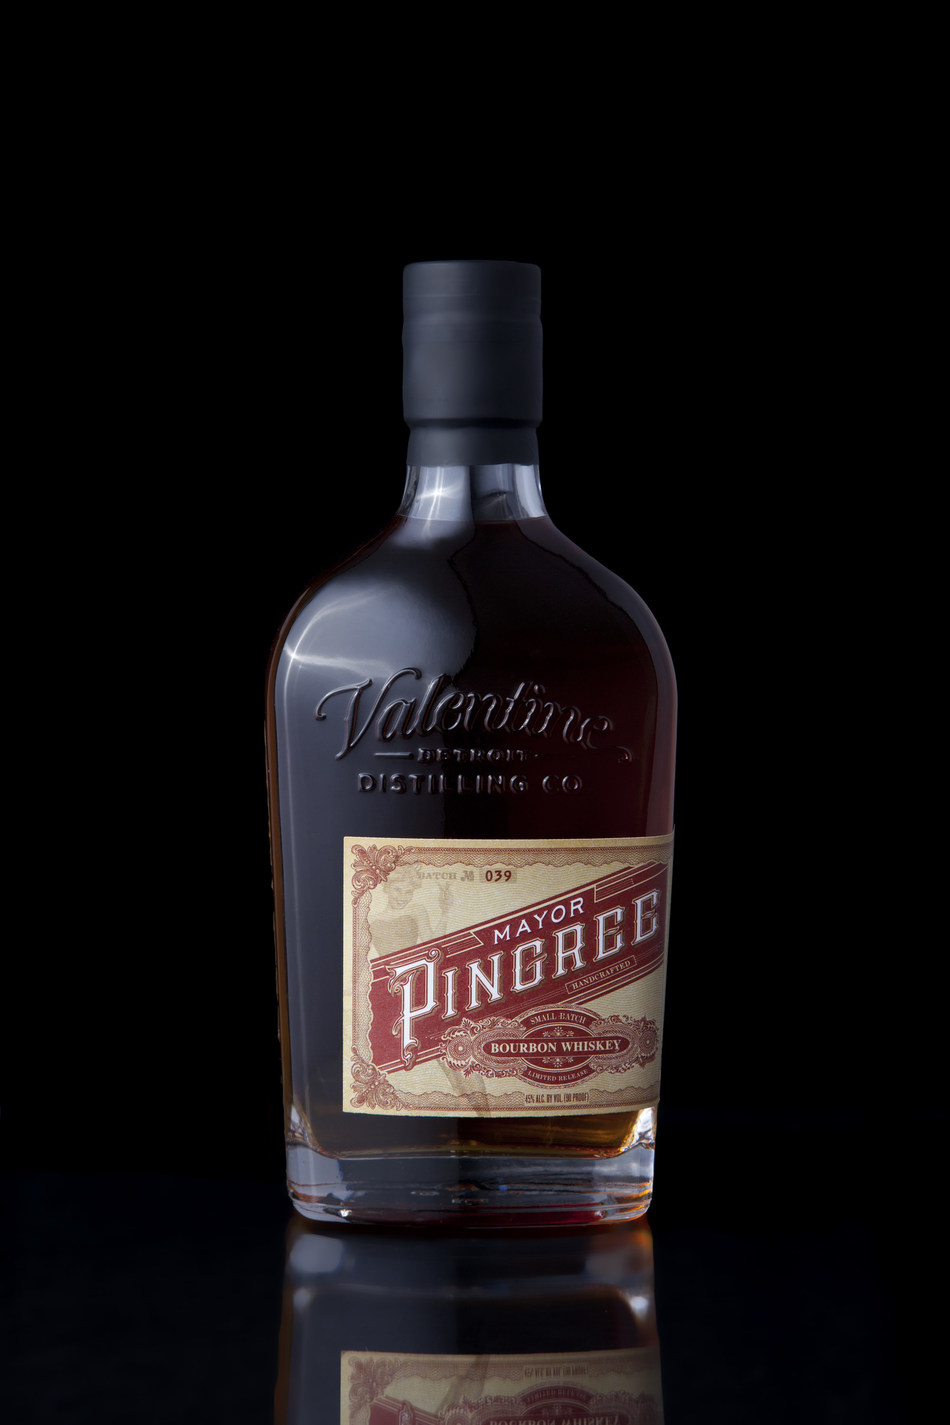 Valentine Distilling Co. Mayor Pingree Red Label Bourbon Whiskey bottle